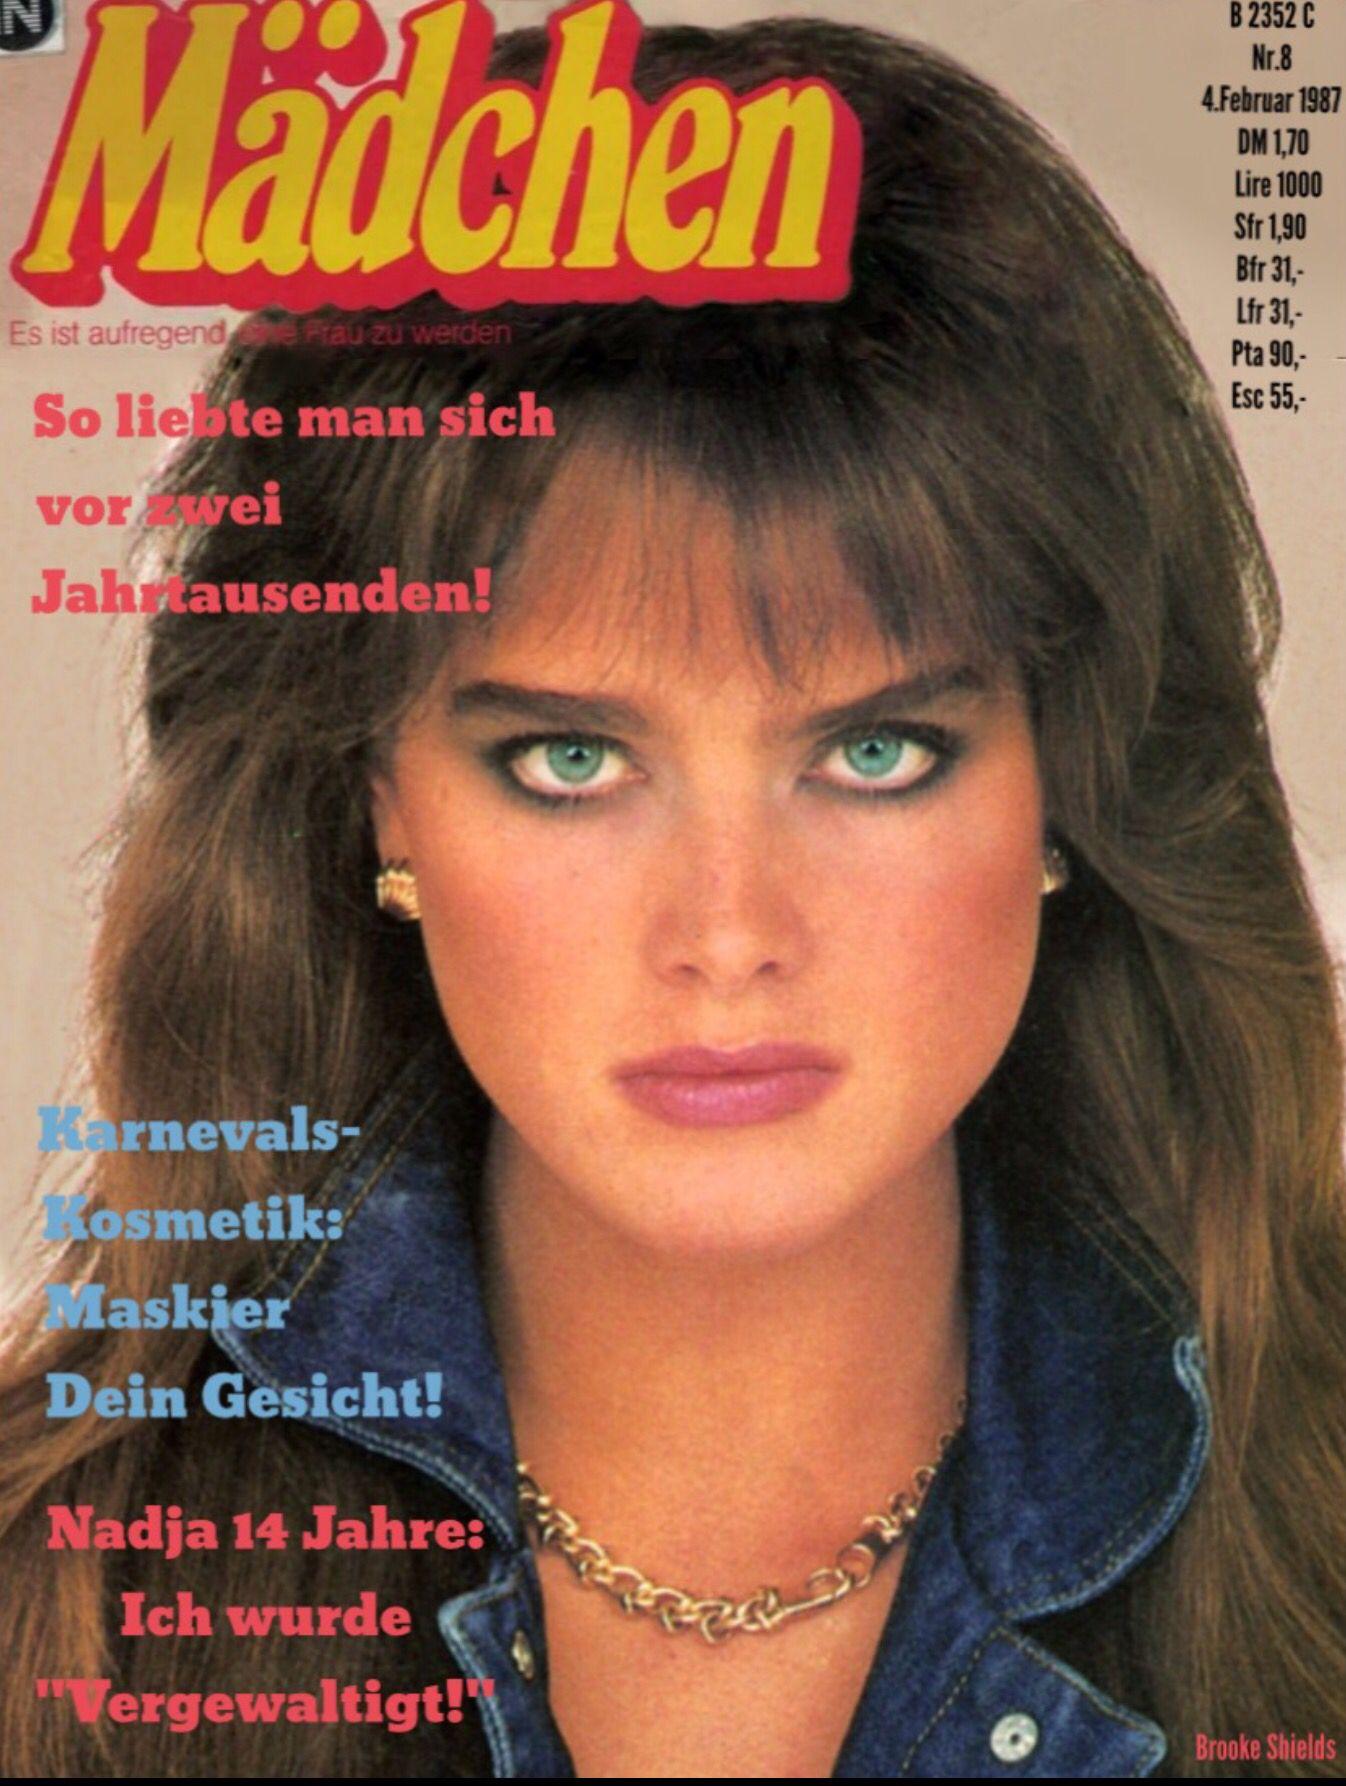 Brooke Shields 1987: Brooke Shields Covers Madchen Magazine ( Germany